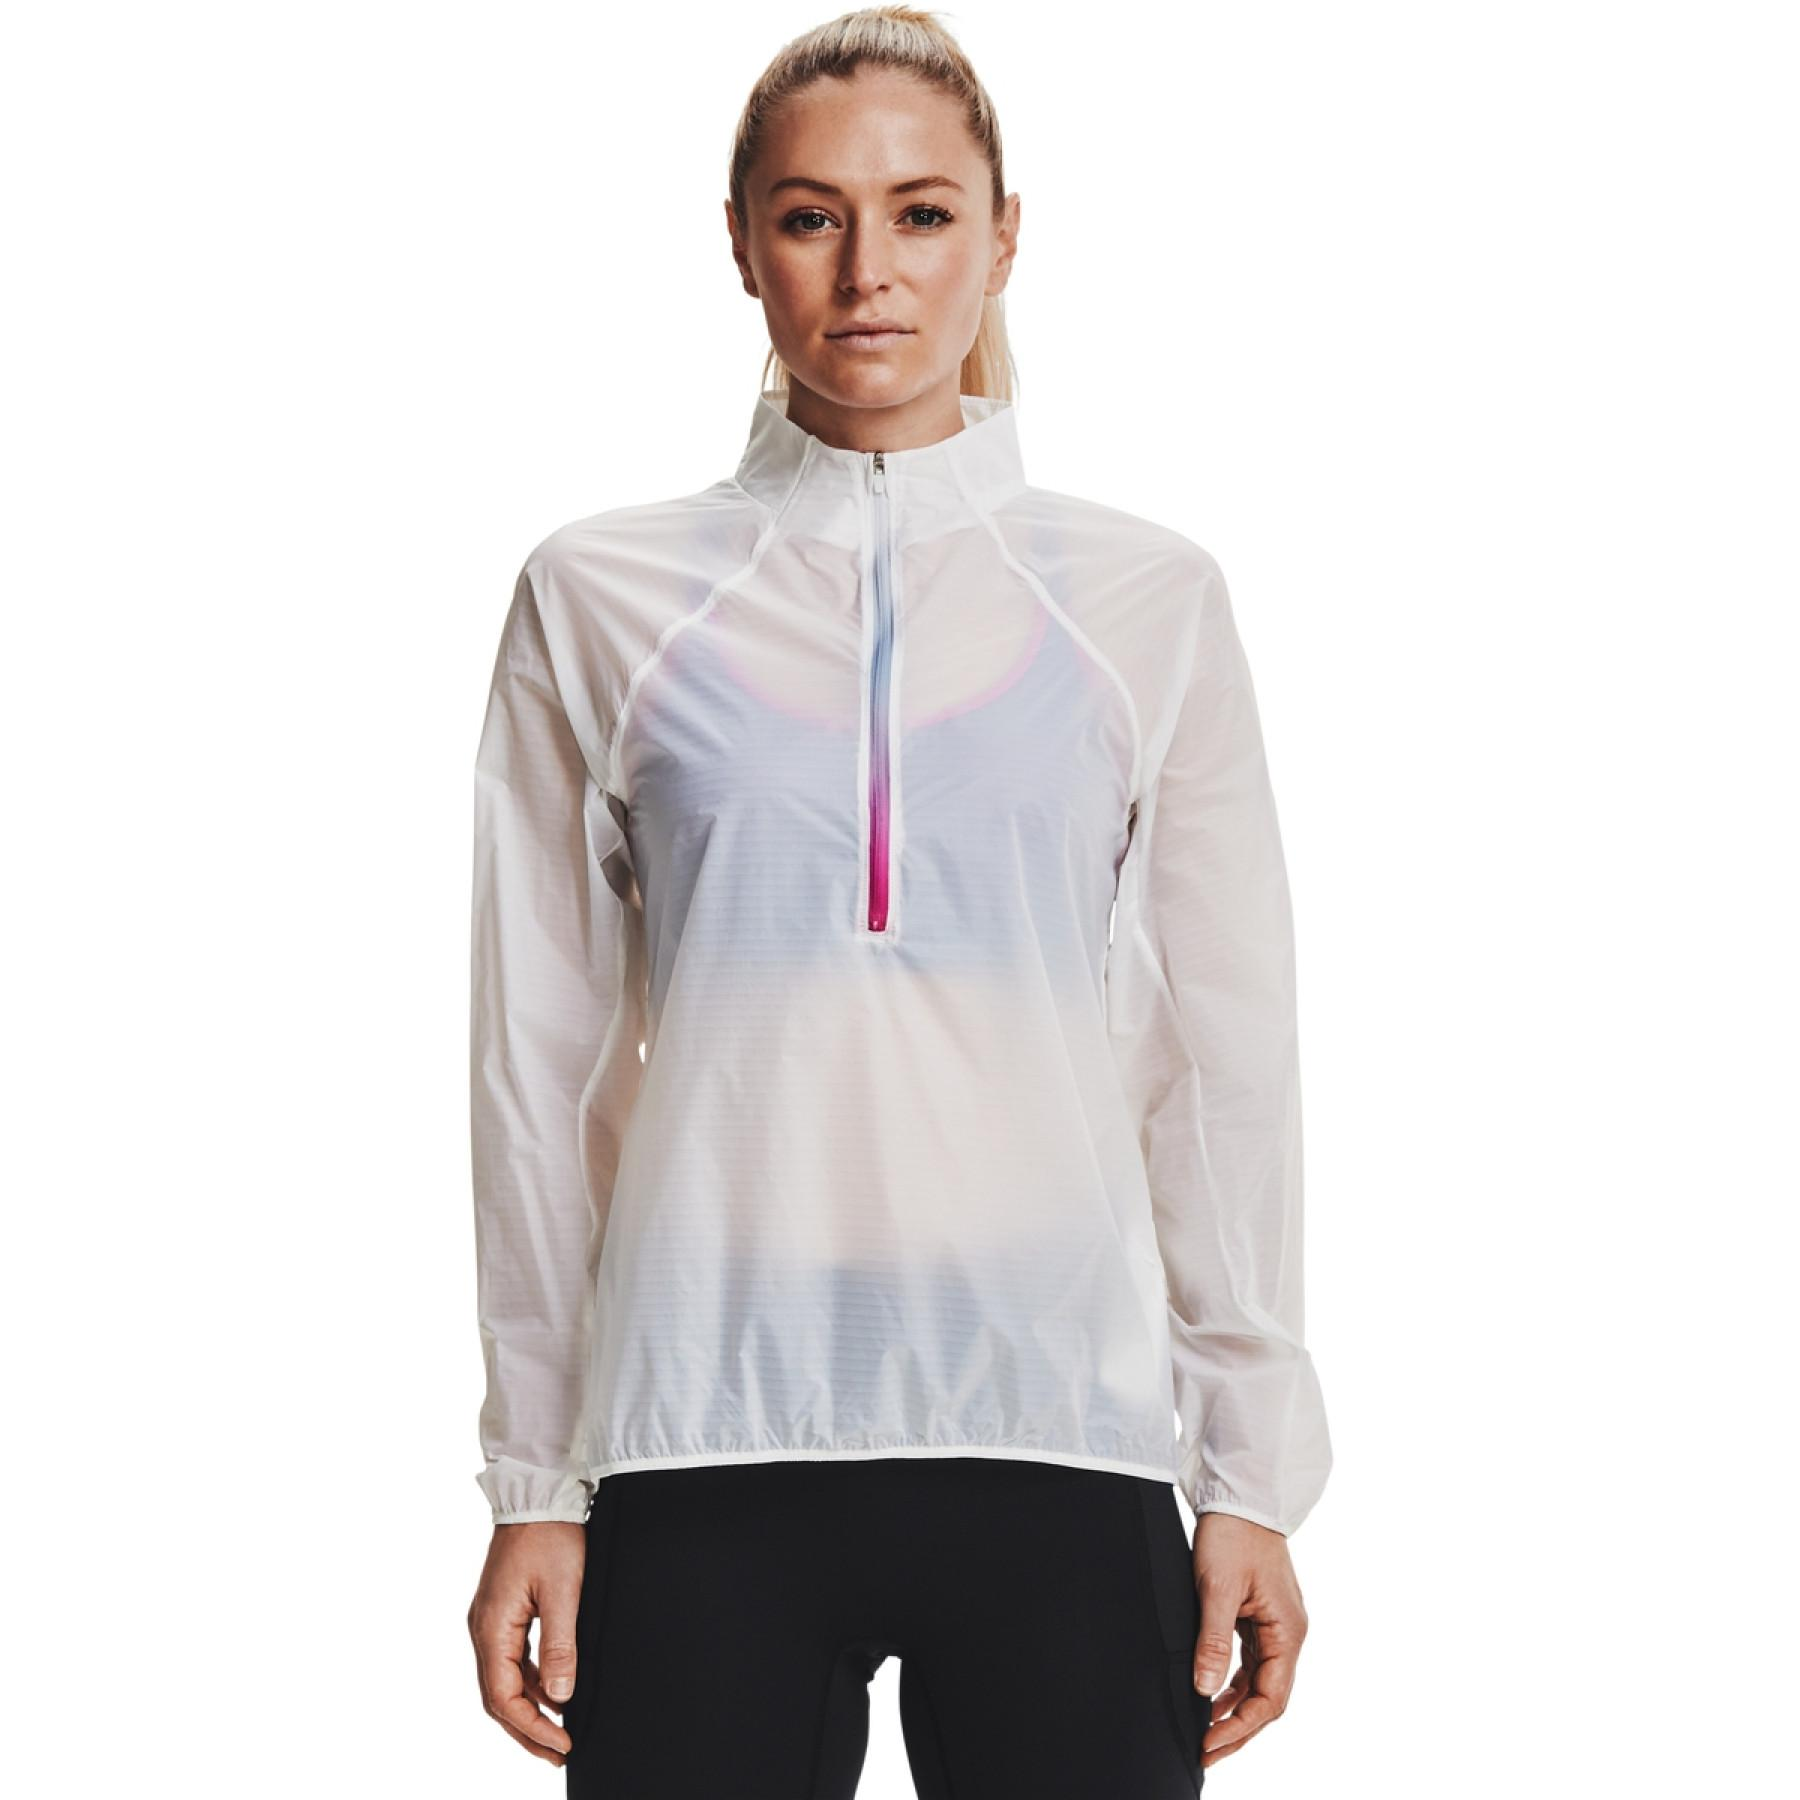 Under Armour women's ½ zip Flight jersey